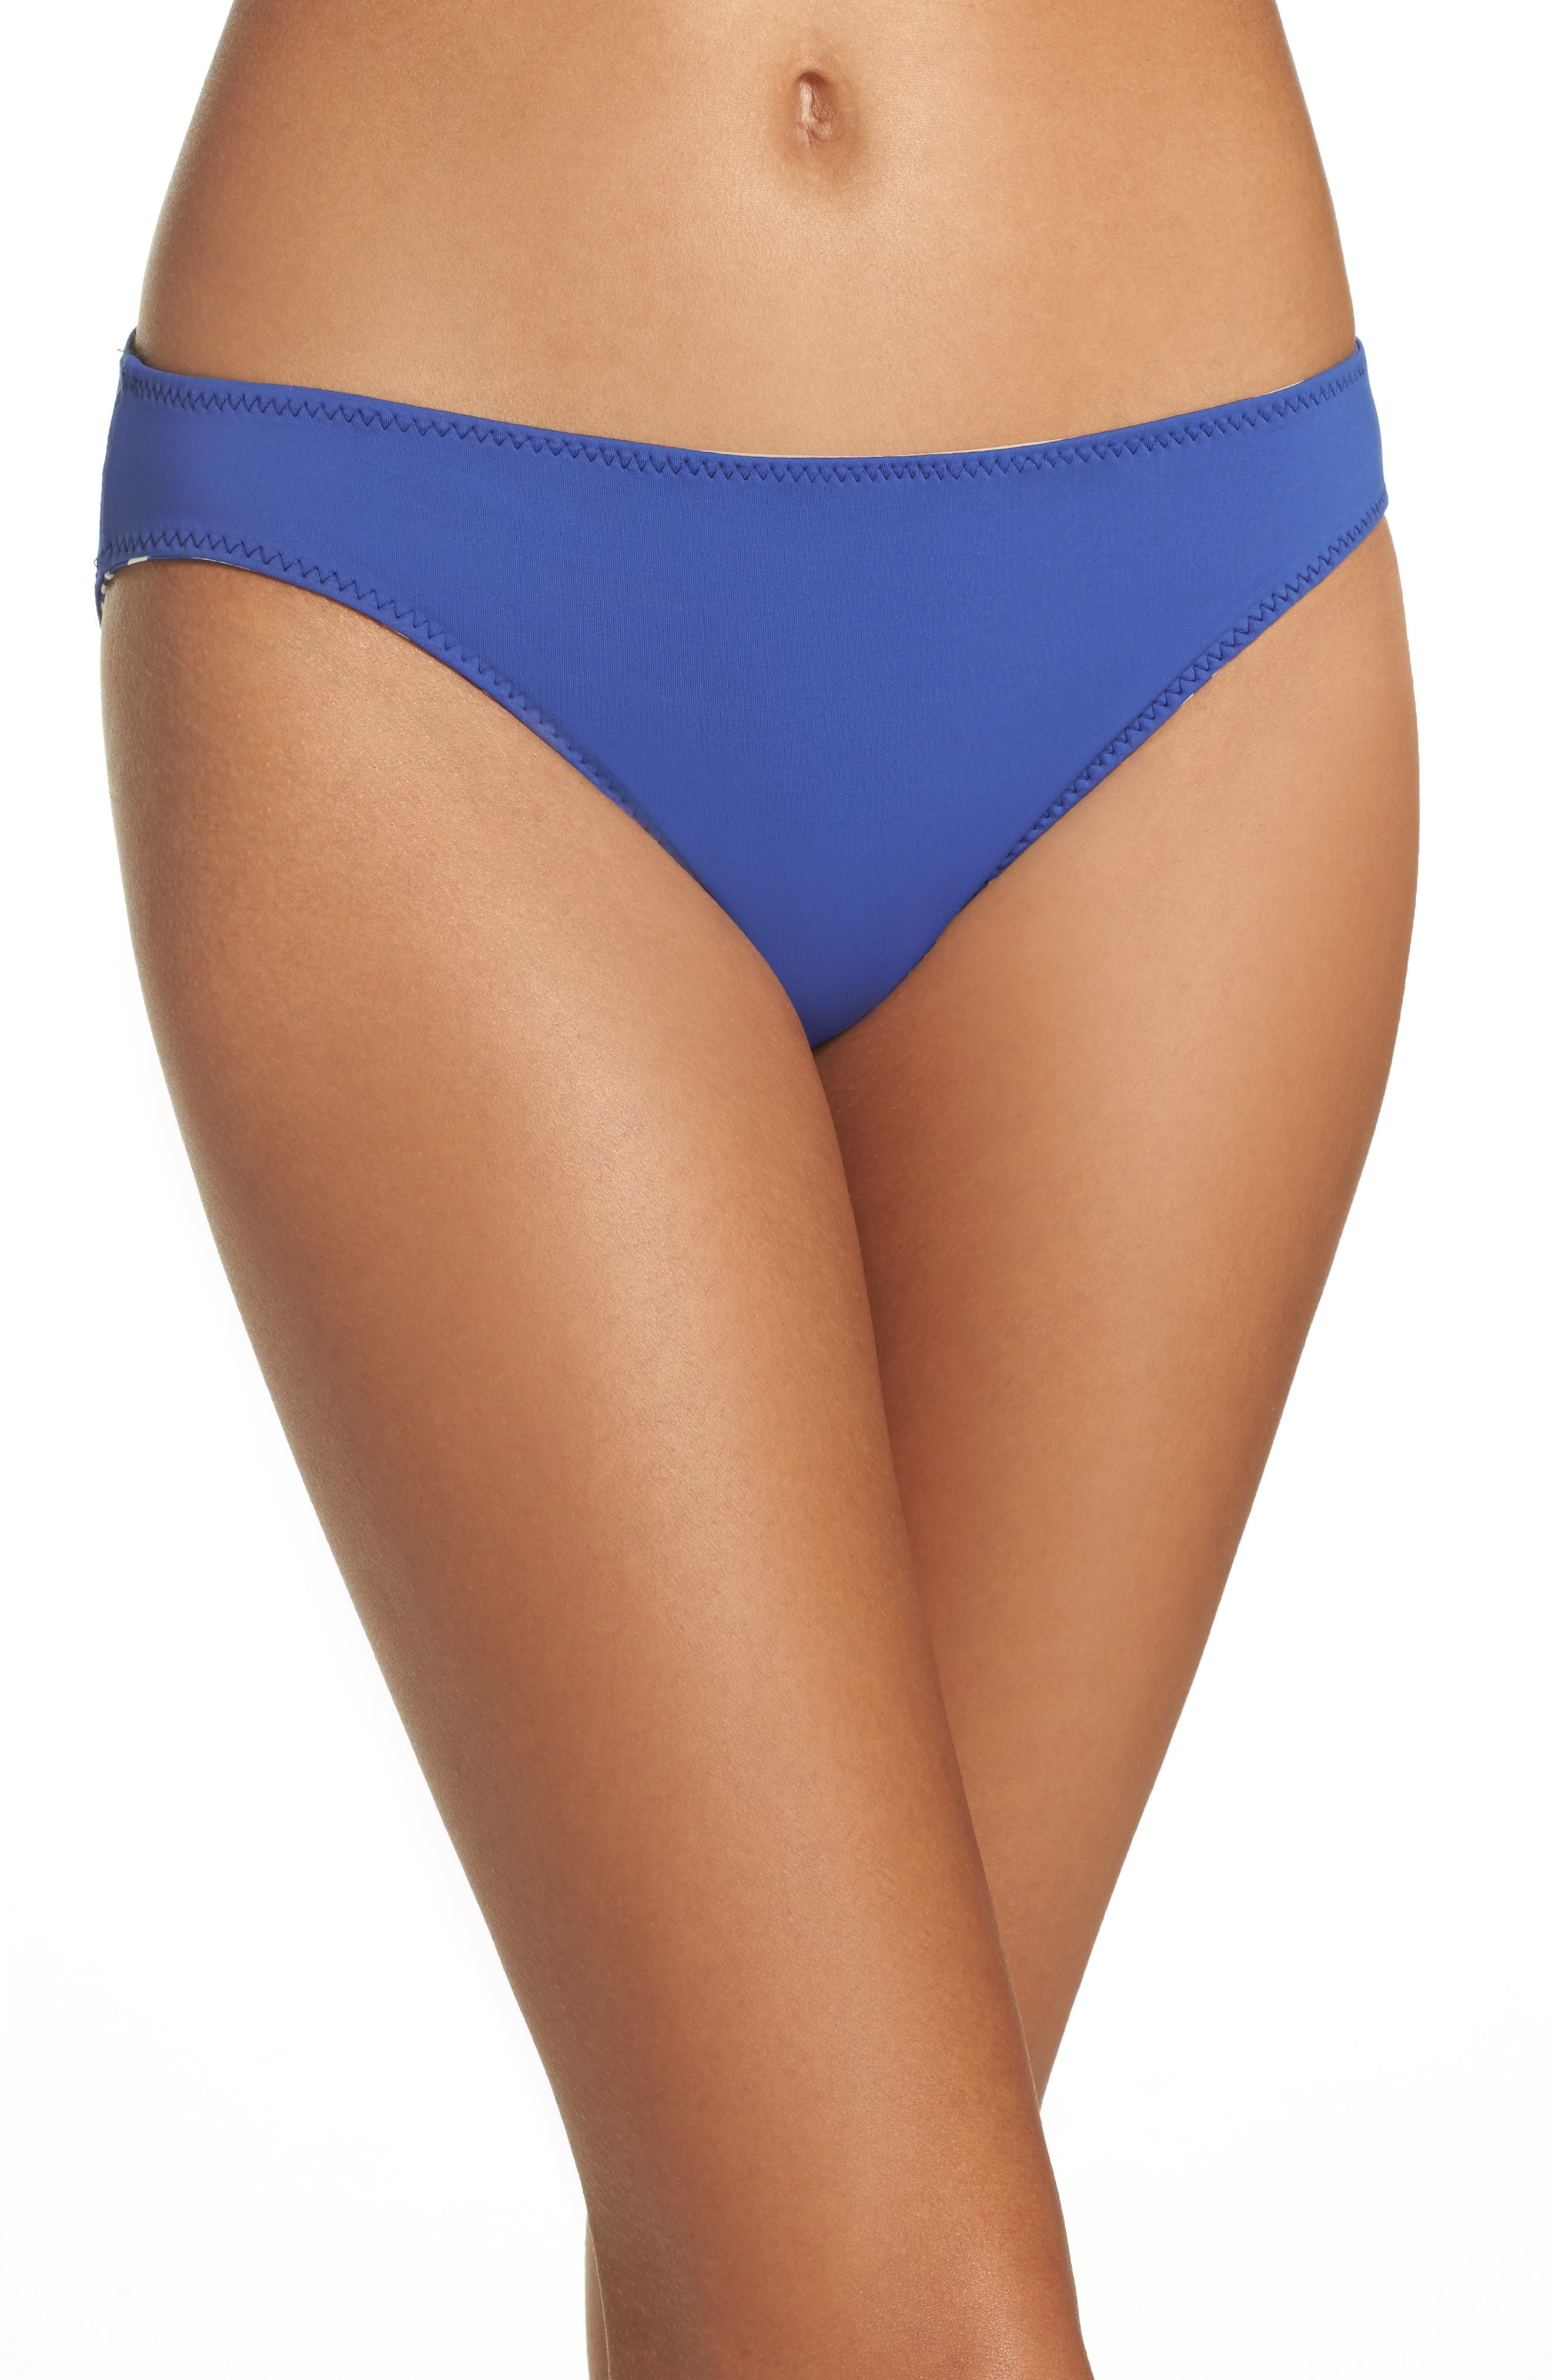 Alternate Image 2  - Tommy Bahama Reversible Hipster Bikini Bottoms